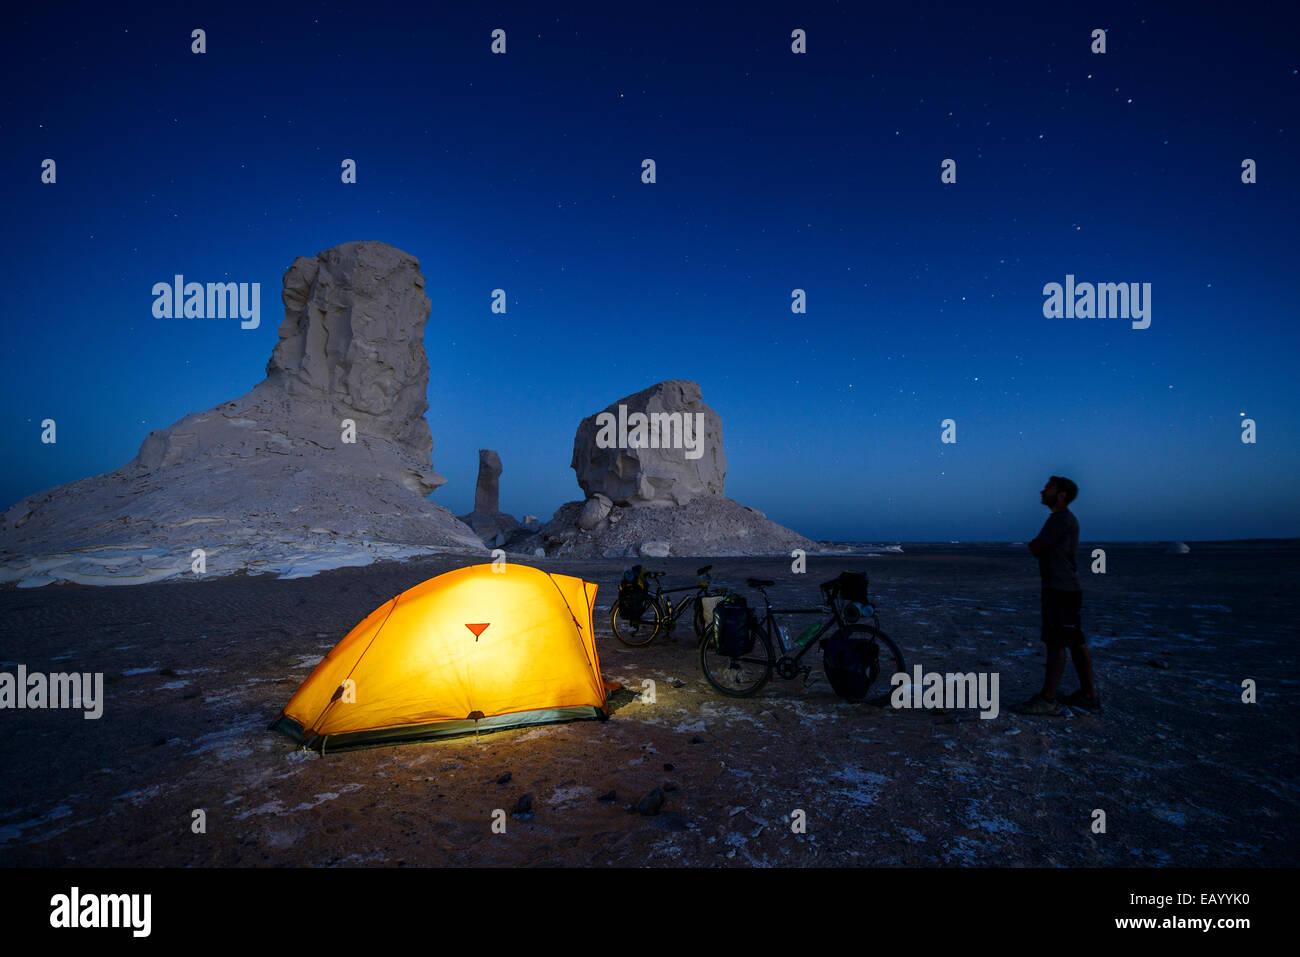 La acampada en el desierto blanco desierto de Sahara, Egipto Foto de stock